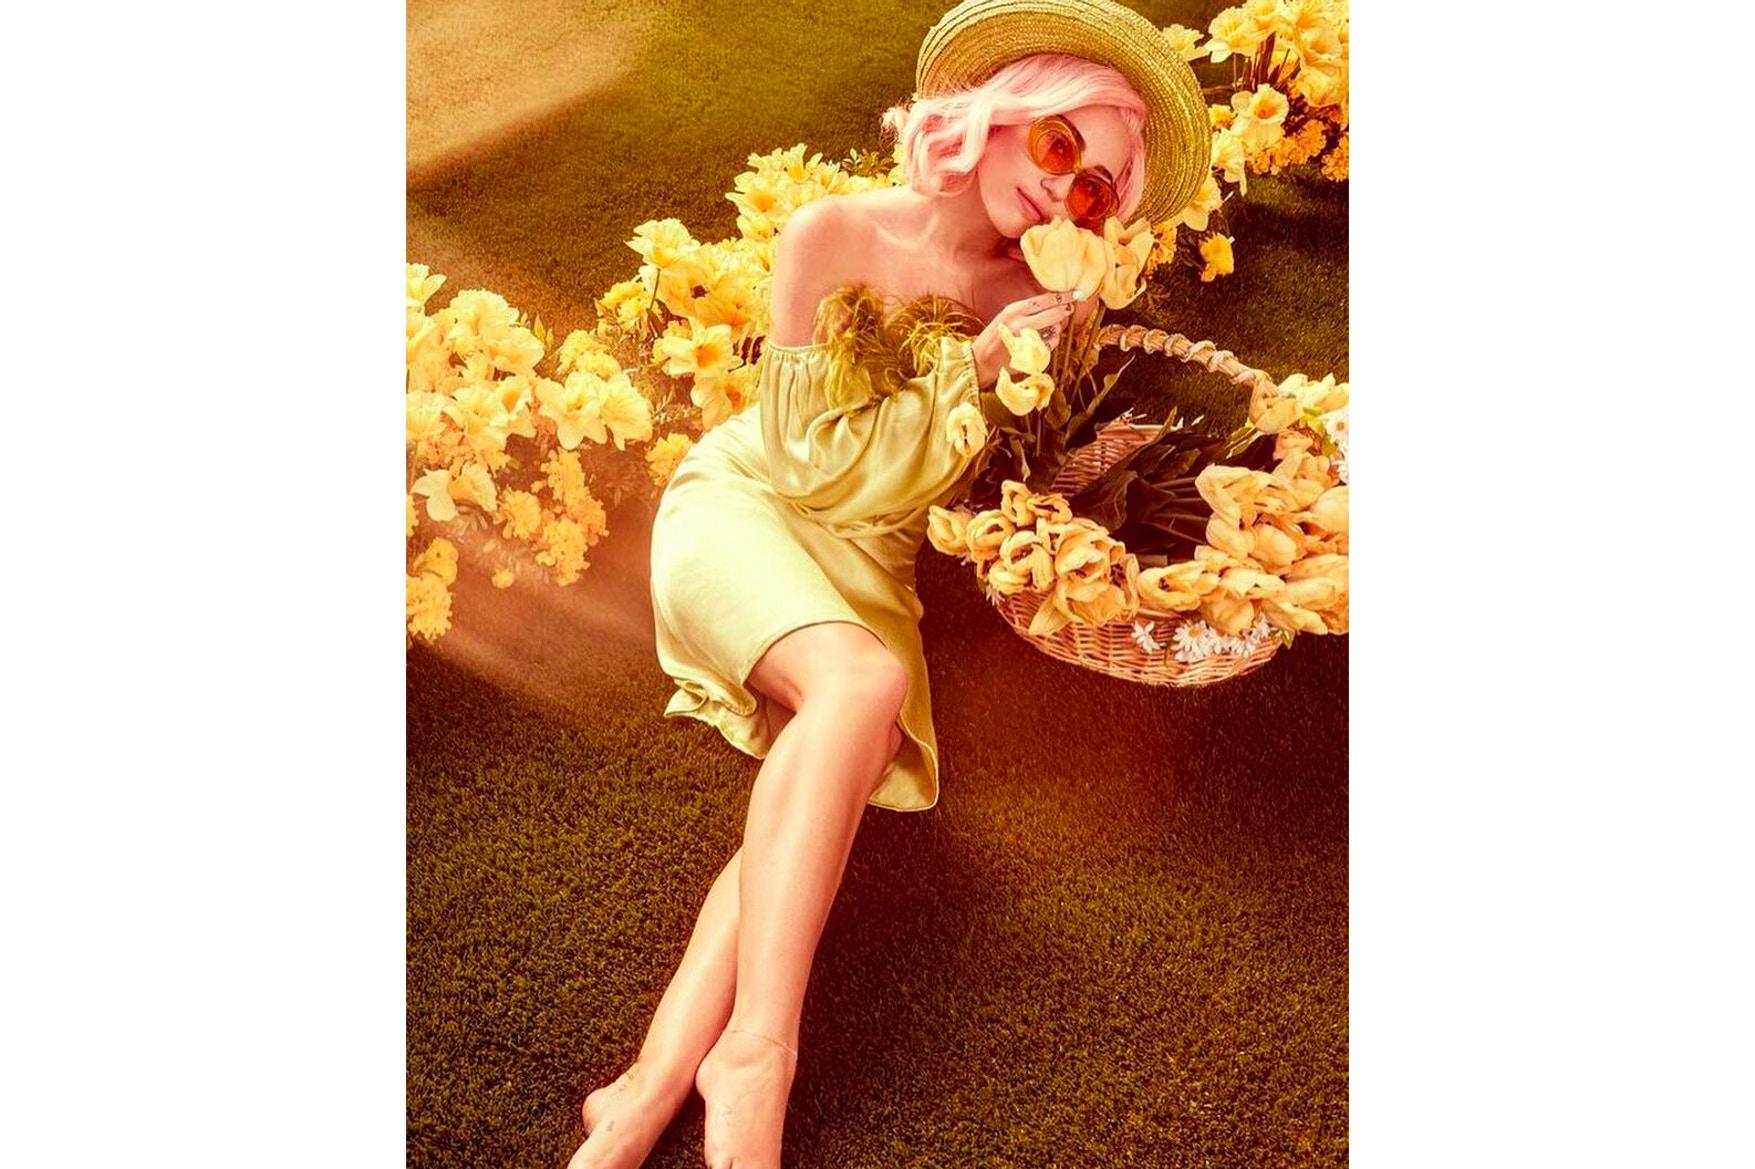 Miley Cyrus 復活節扮成性感兔女郎 其中一張照片有亮點 揭示了最新 Converse 聯名鞋